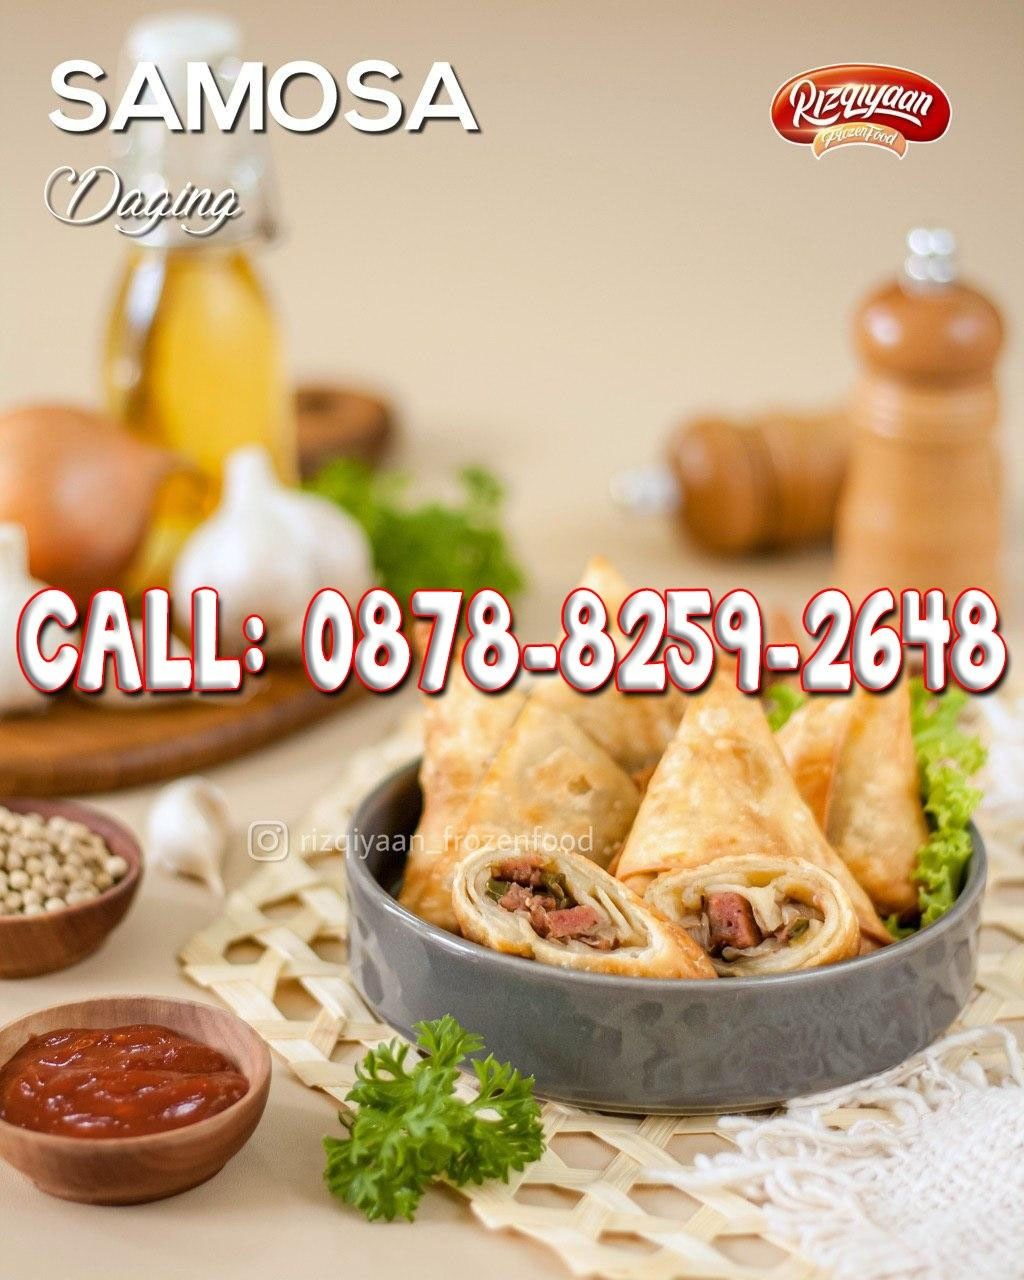 Lezat Call 0878 8259 2648 Distributor Daging Sapi Beku Sidoarjo Daging Sapi Cincang Kebab Daging Sapi